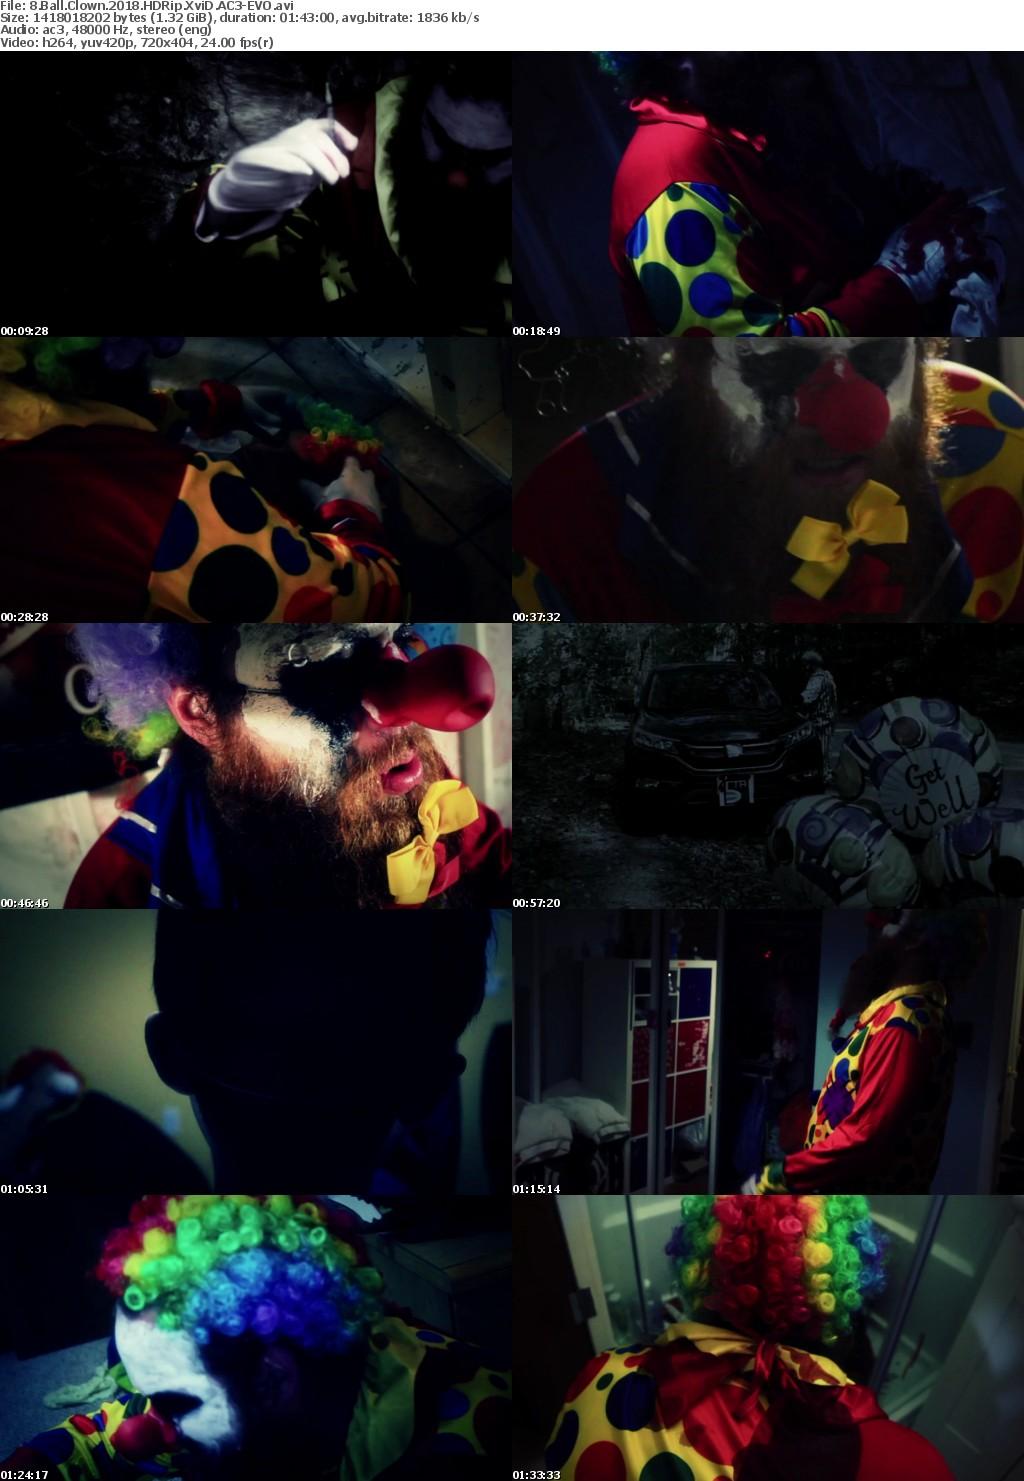 8 Ball Clown (2018) HDRip XviD AC3-EVO